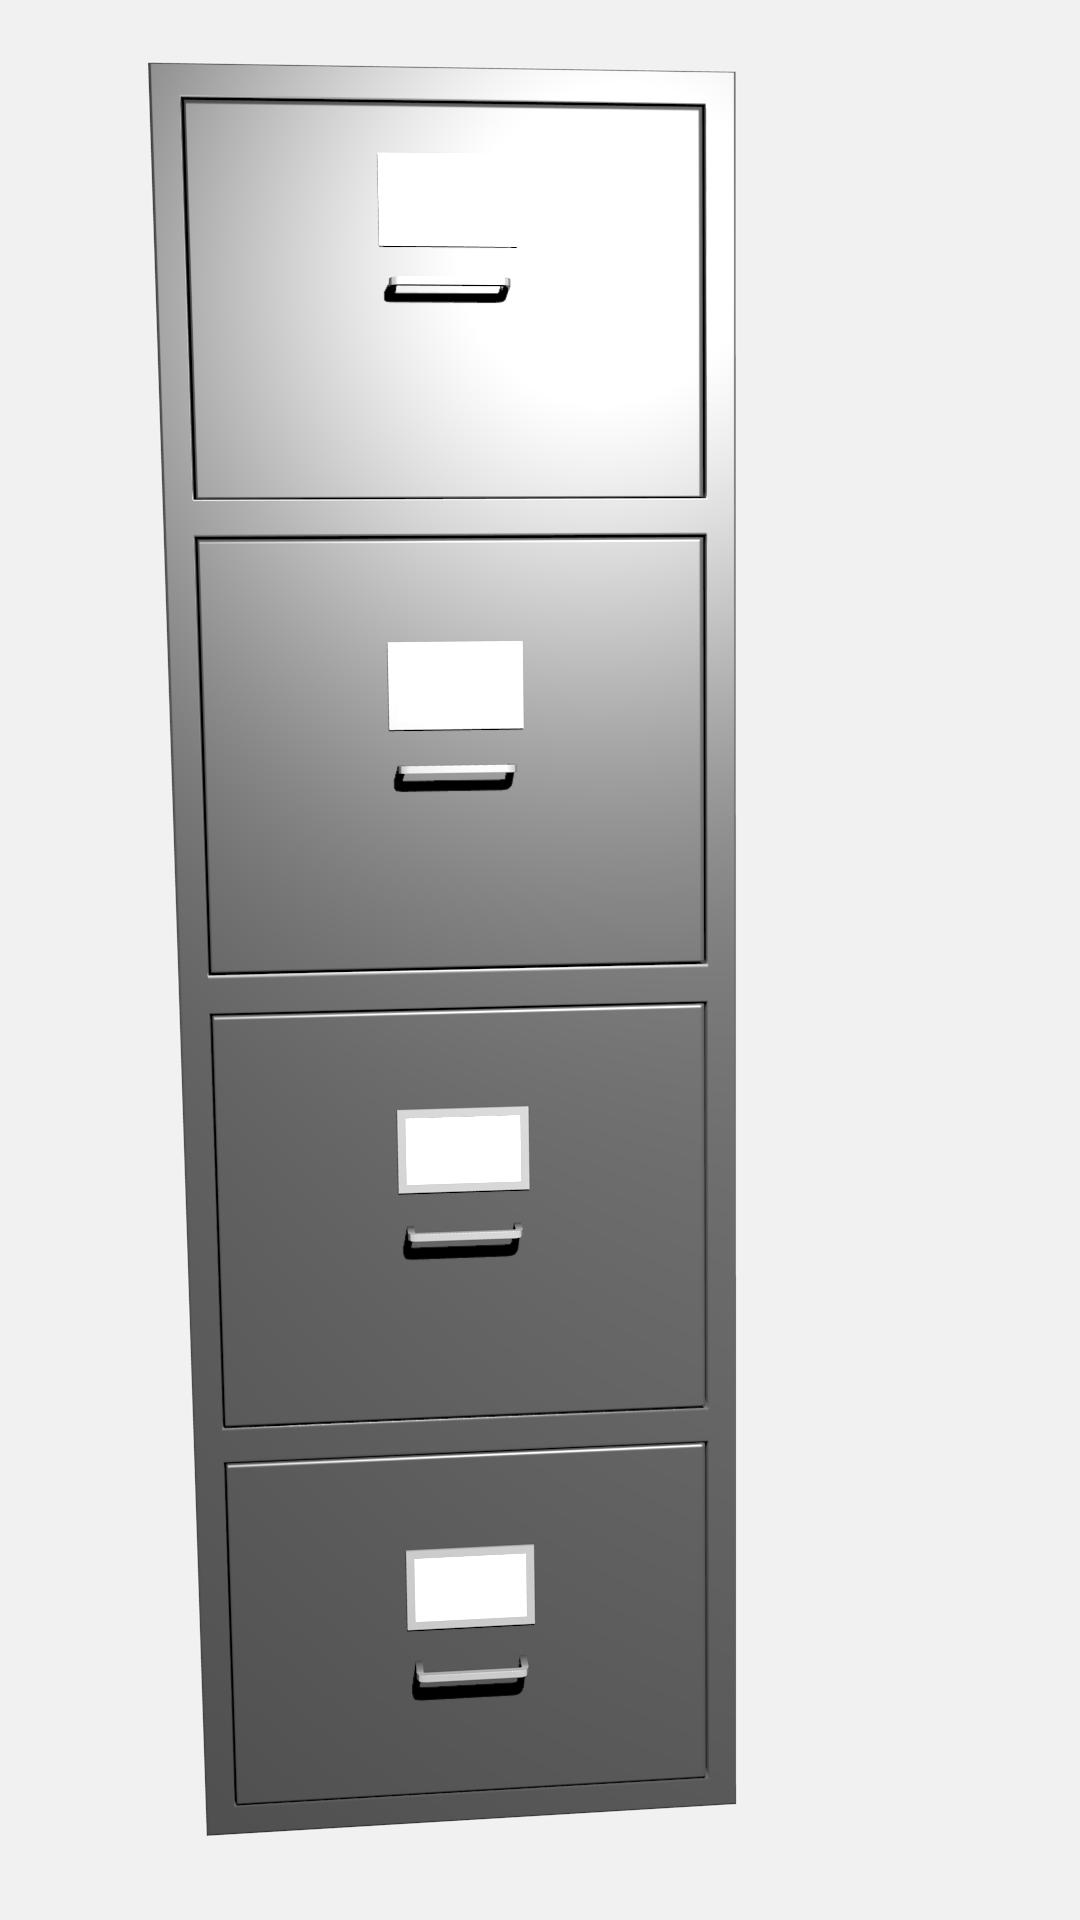 Filing cabinet 3D model CGTrader